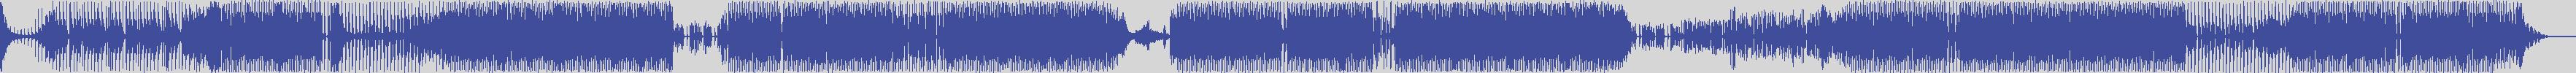 just_digital_records [JS1121] Franz Costa - Halftower [Original Mix] audio wave form